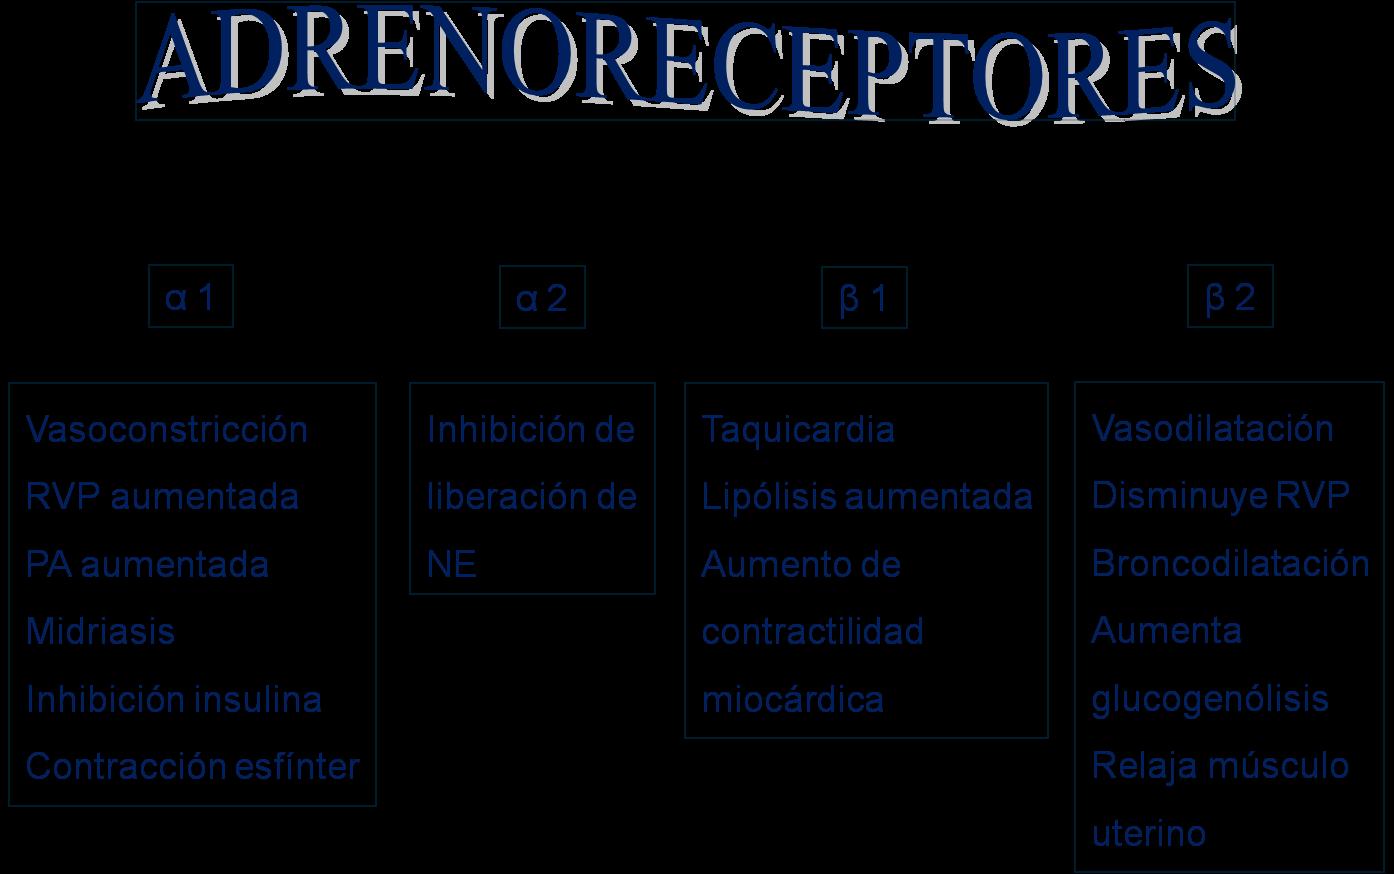 farmacos antiinflamatorios esteroideos aines